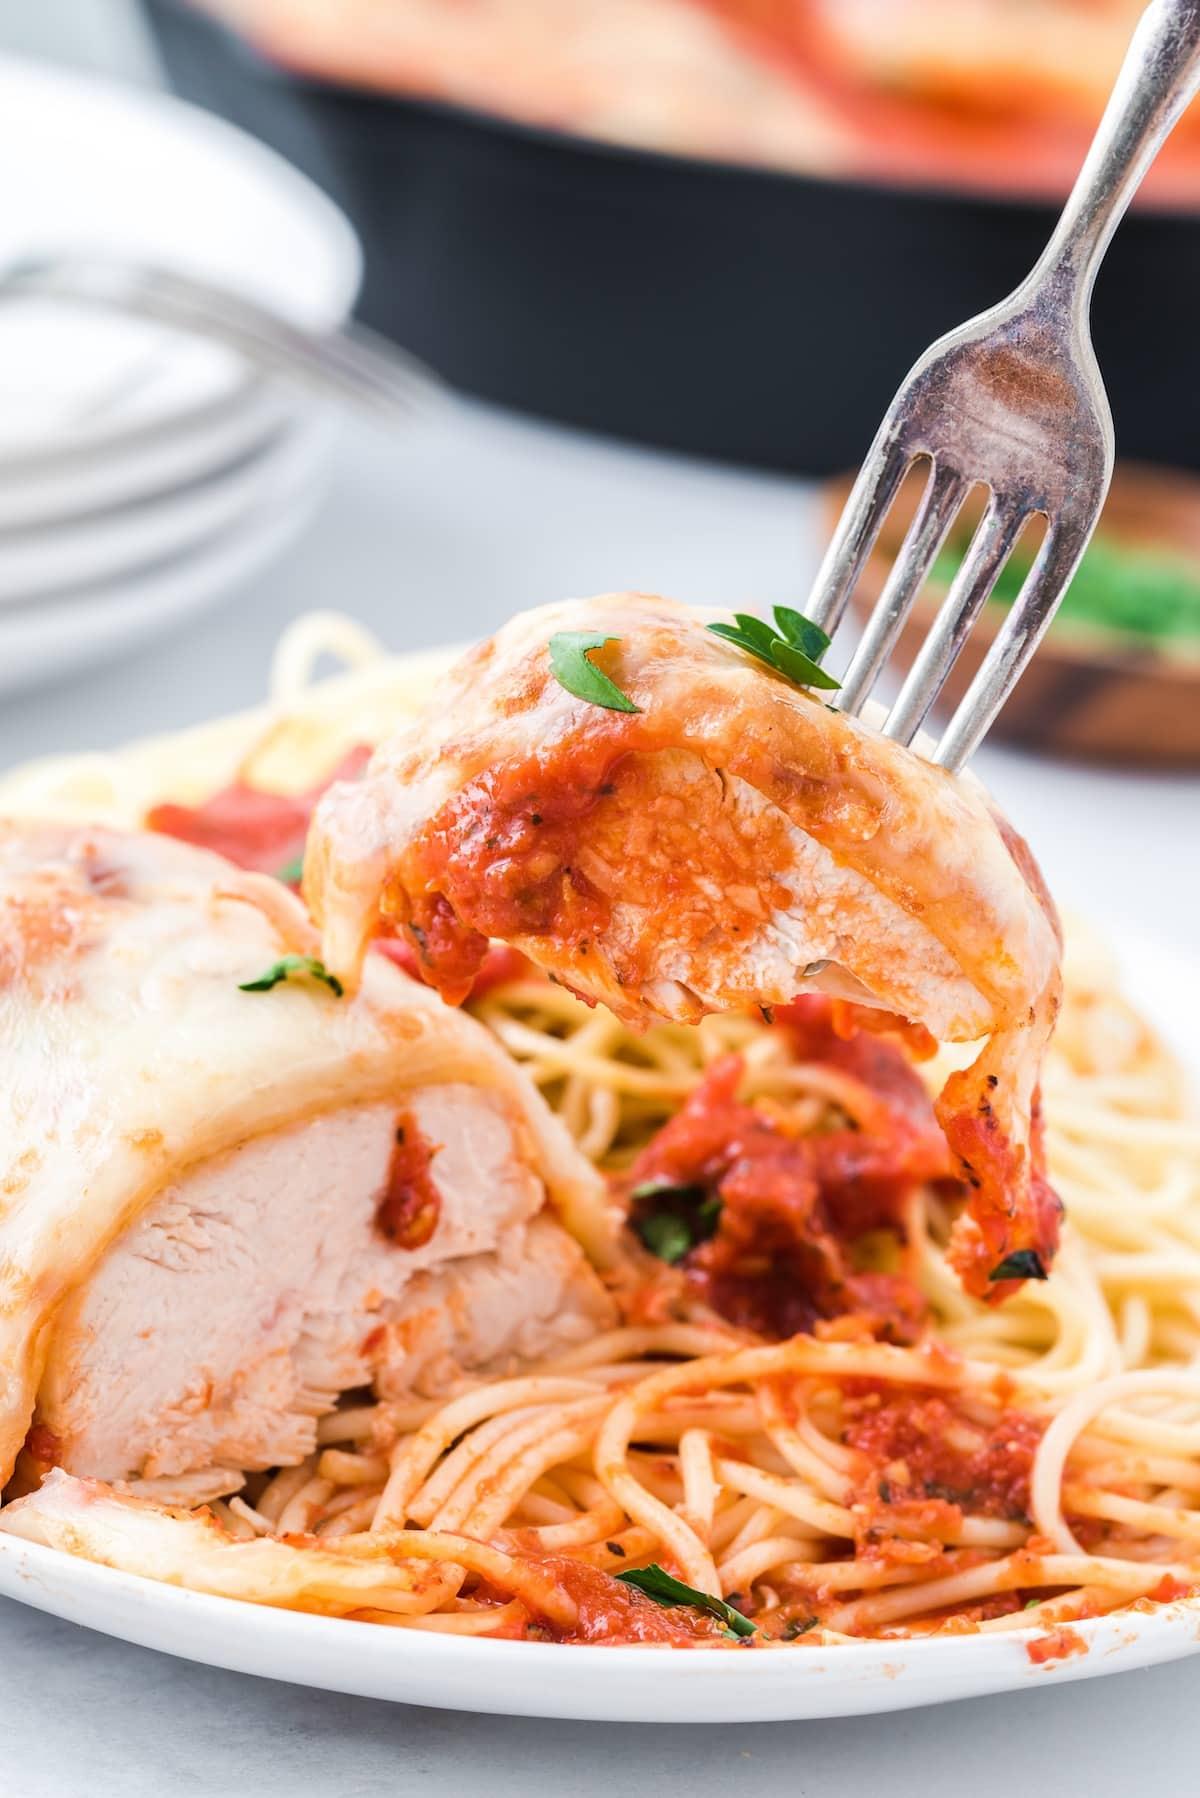 eat mozzarella chicken using fork